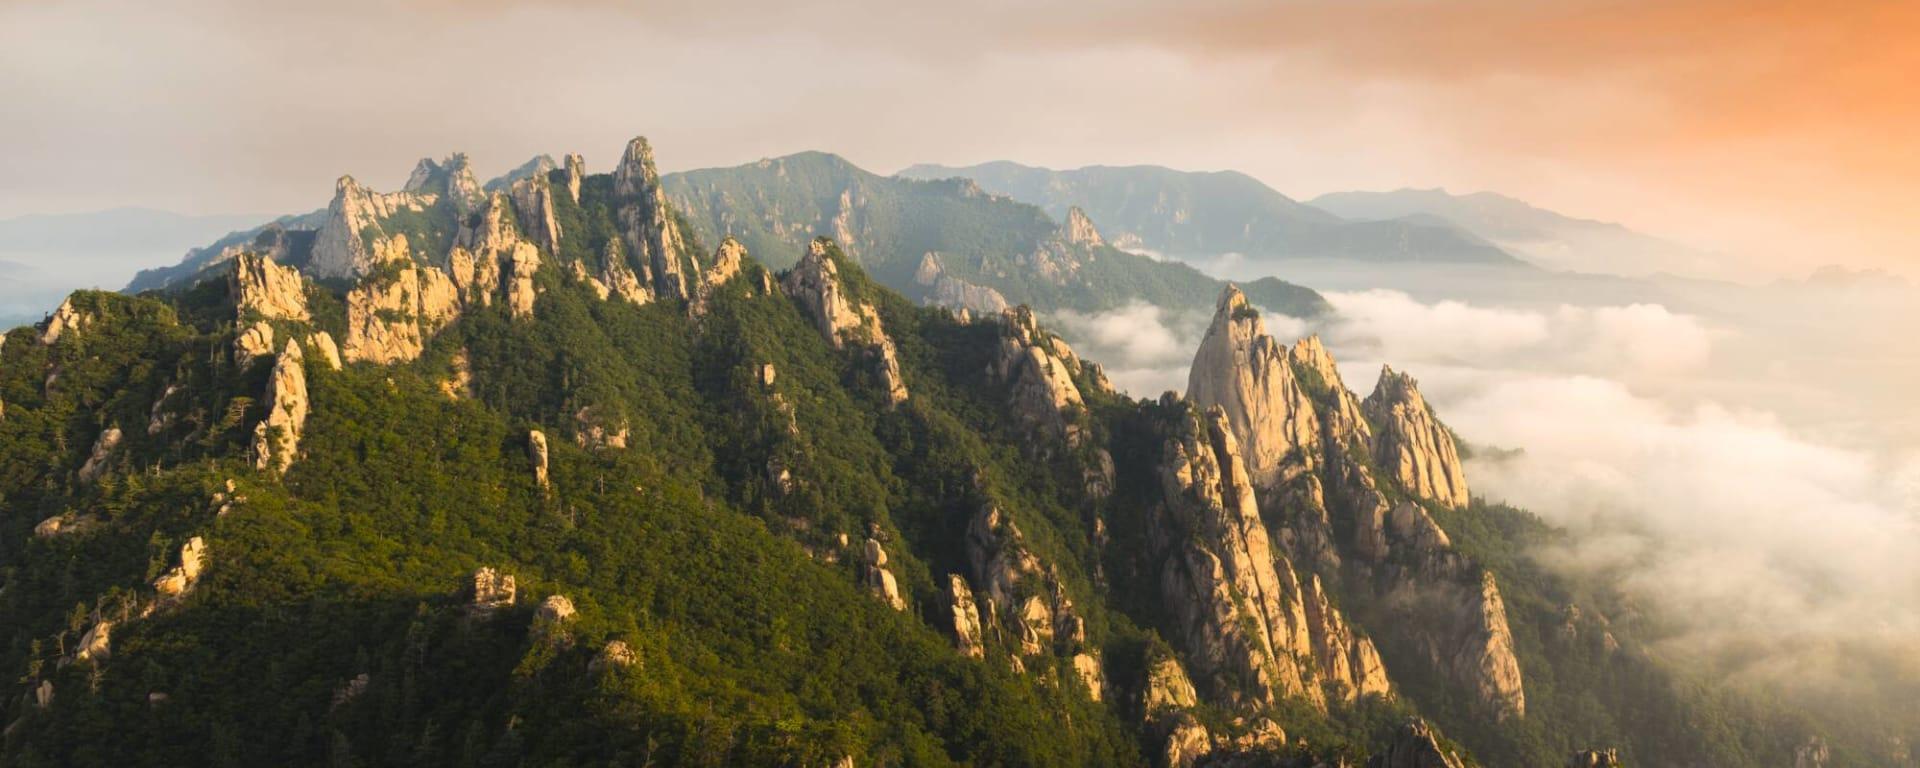 Südkorea entdecken mit Tischler Reisen: Südkorea Seoraksan Nationalpark